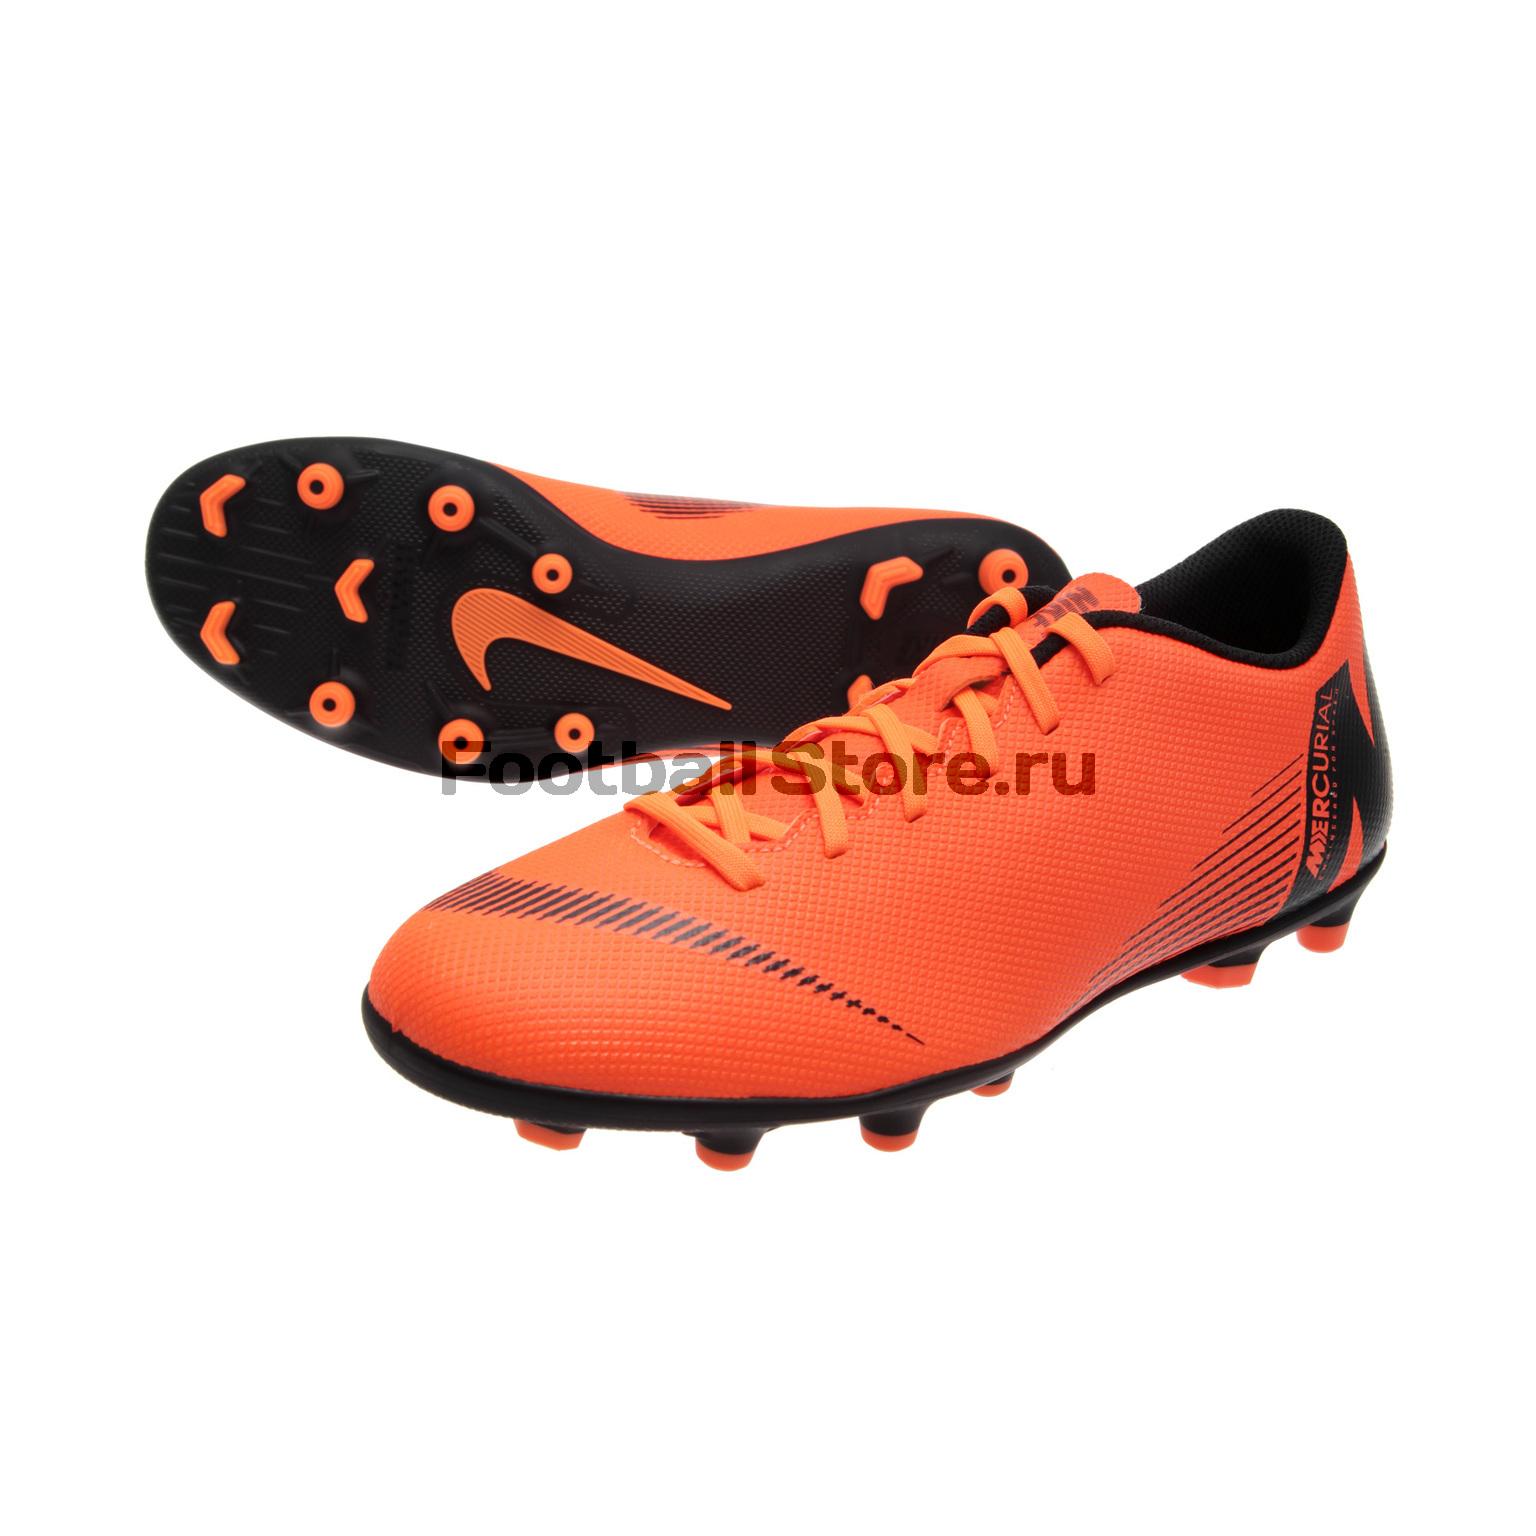 Бутсы Nike Vapor 12 Club FG/MG AH7378-810 рубашка modis modis mo044emvql31